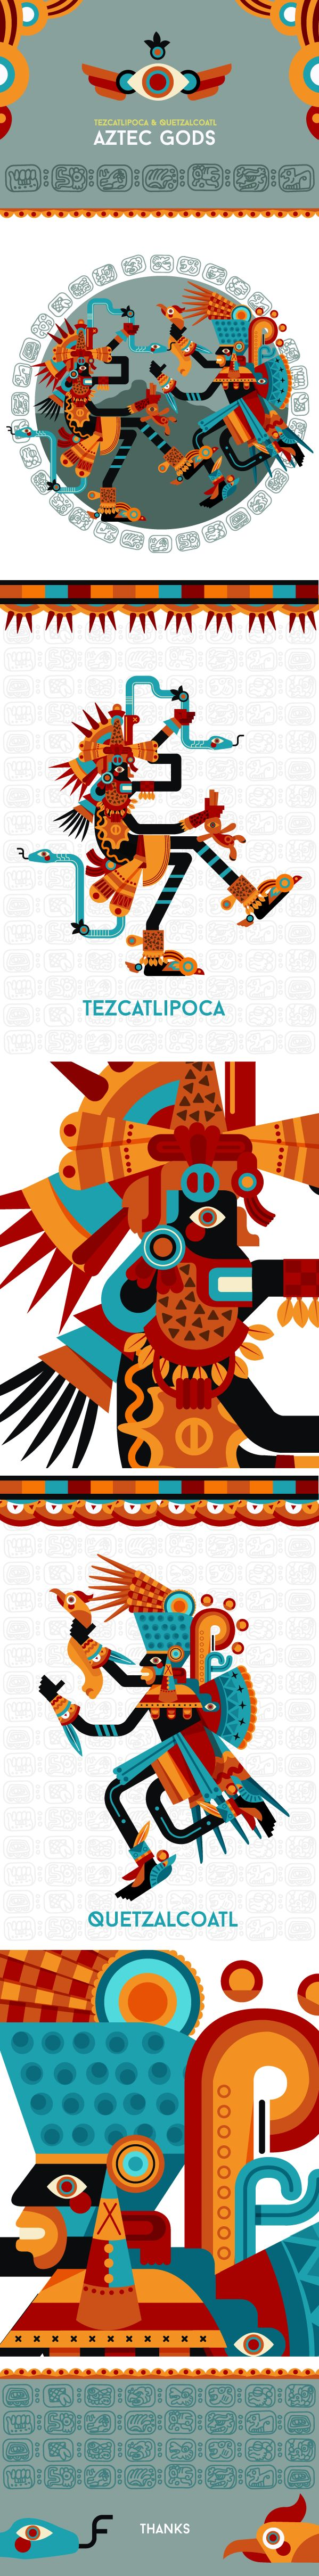 Tezcatlipoca & Quetzalcoatl by Pedro Melo, via Behance